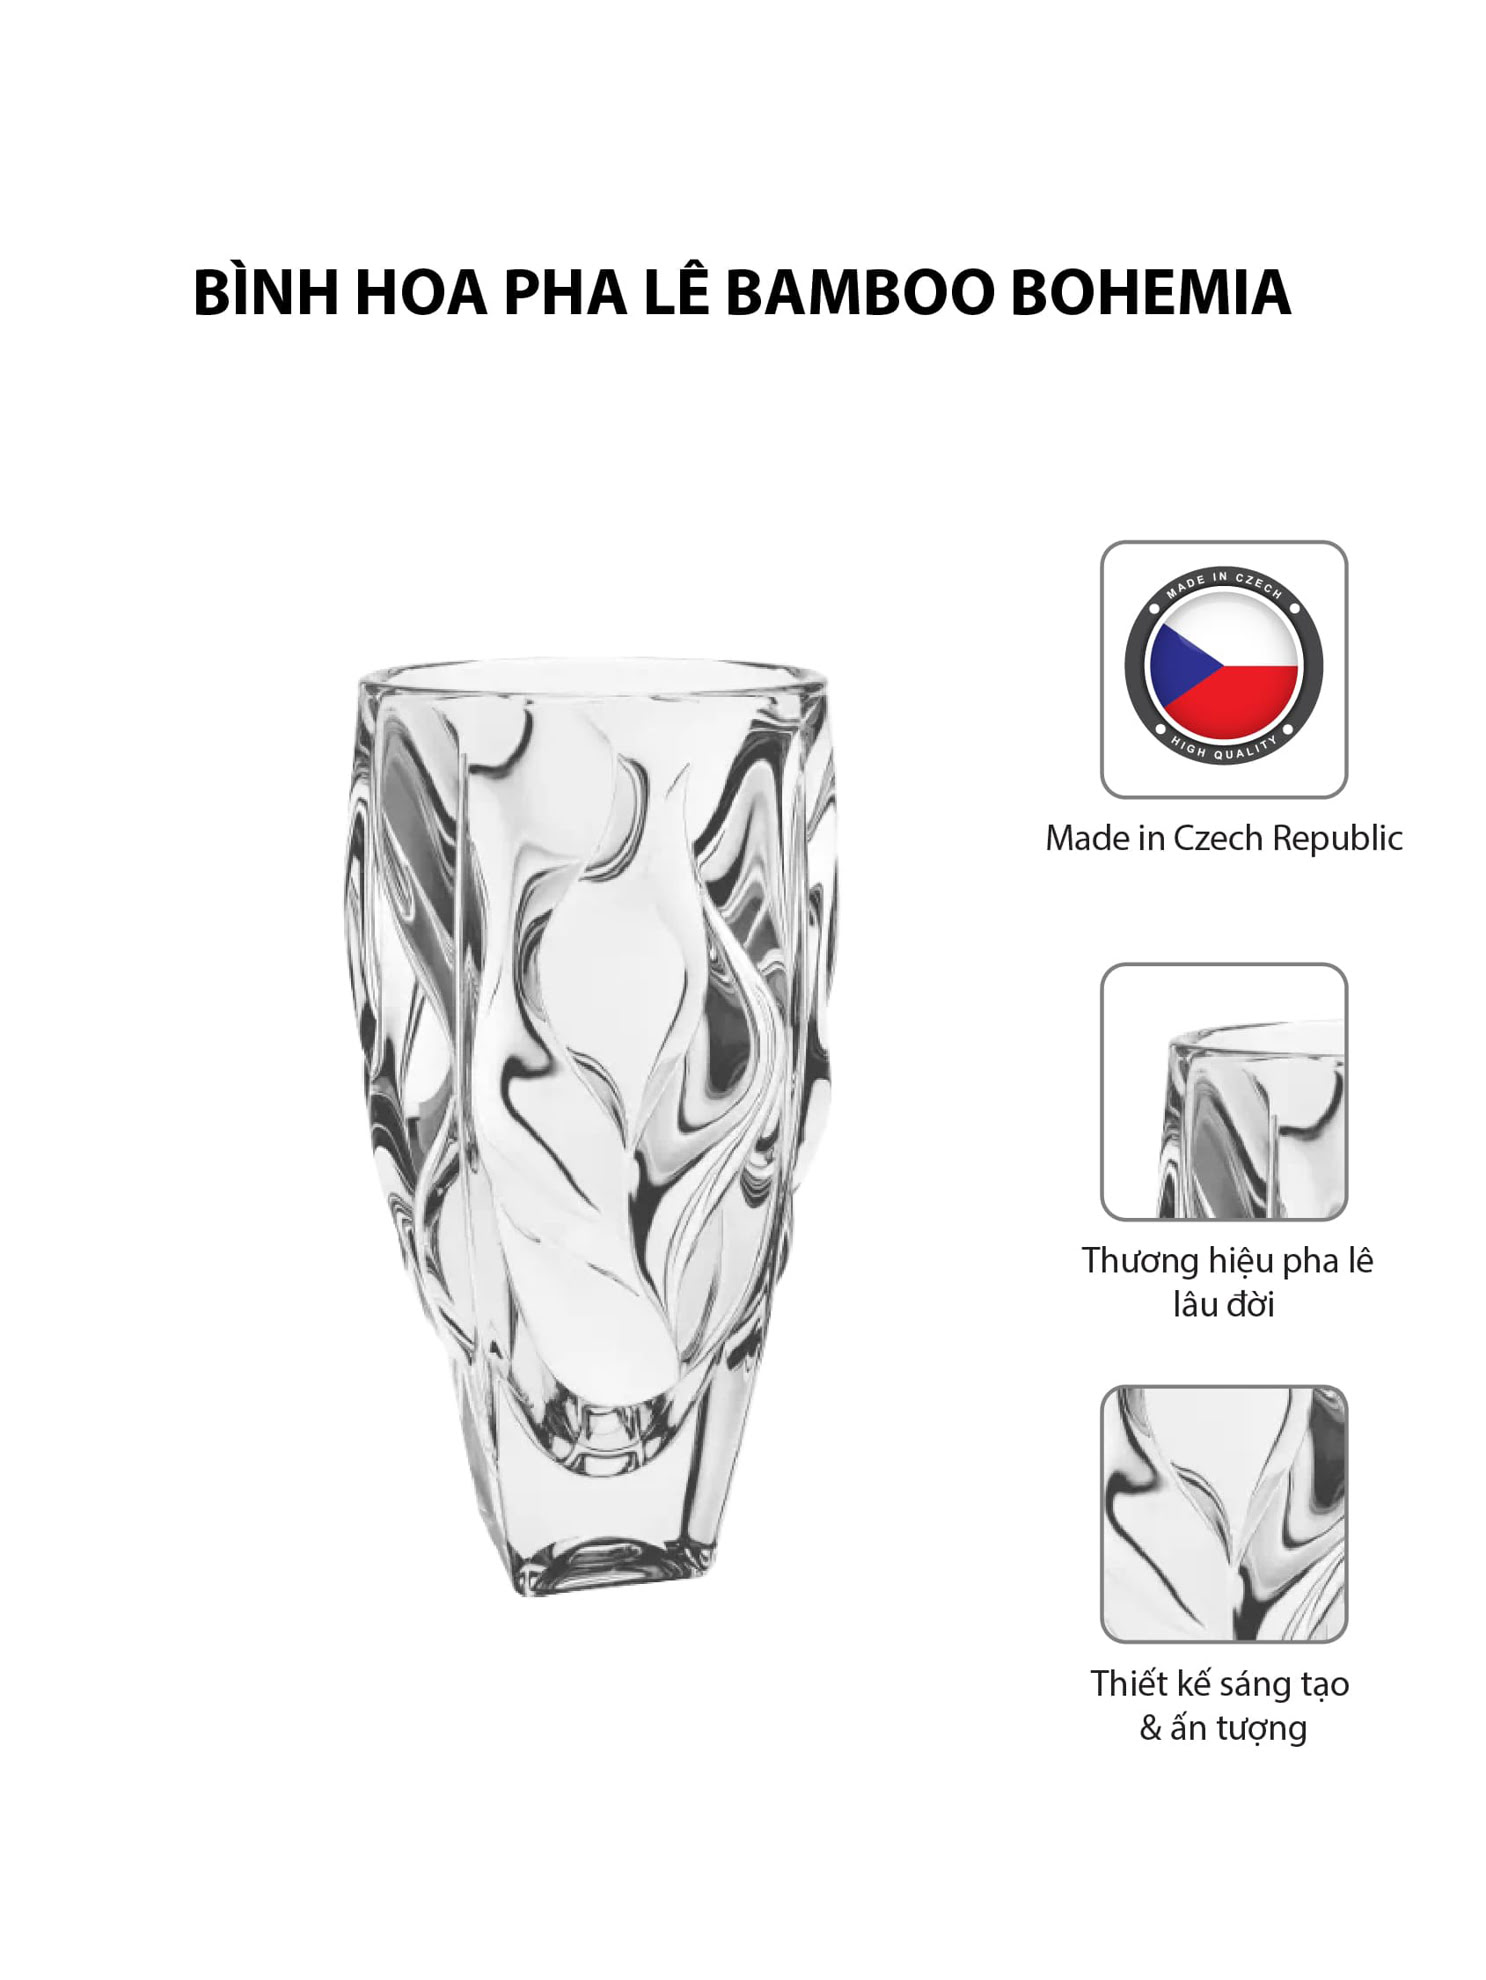 Bình hoa pha lê Bamboo Bohemia